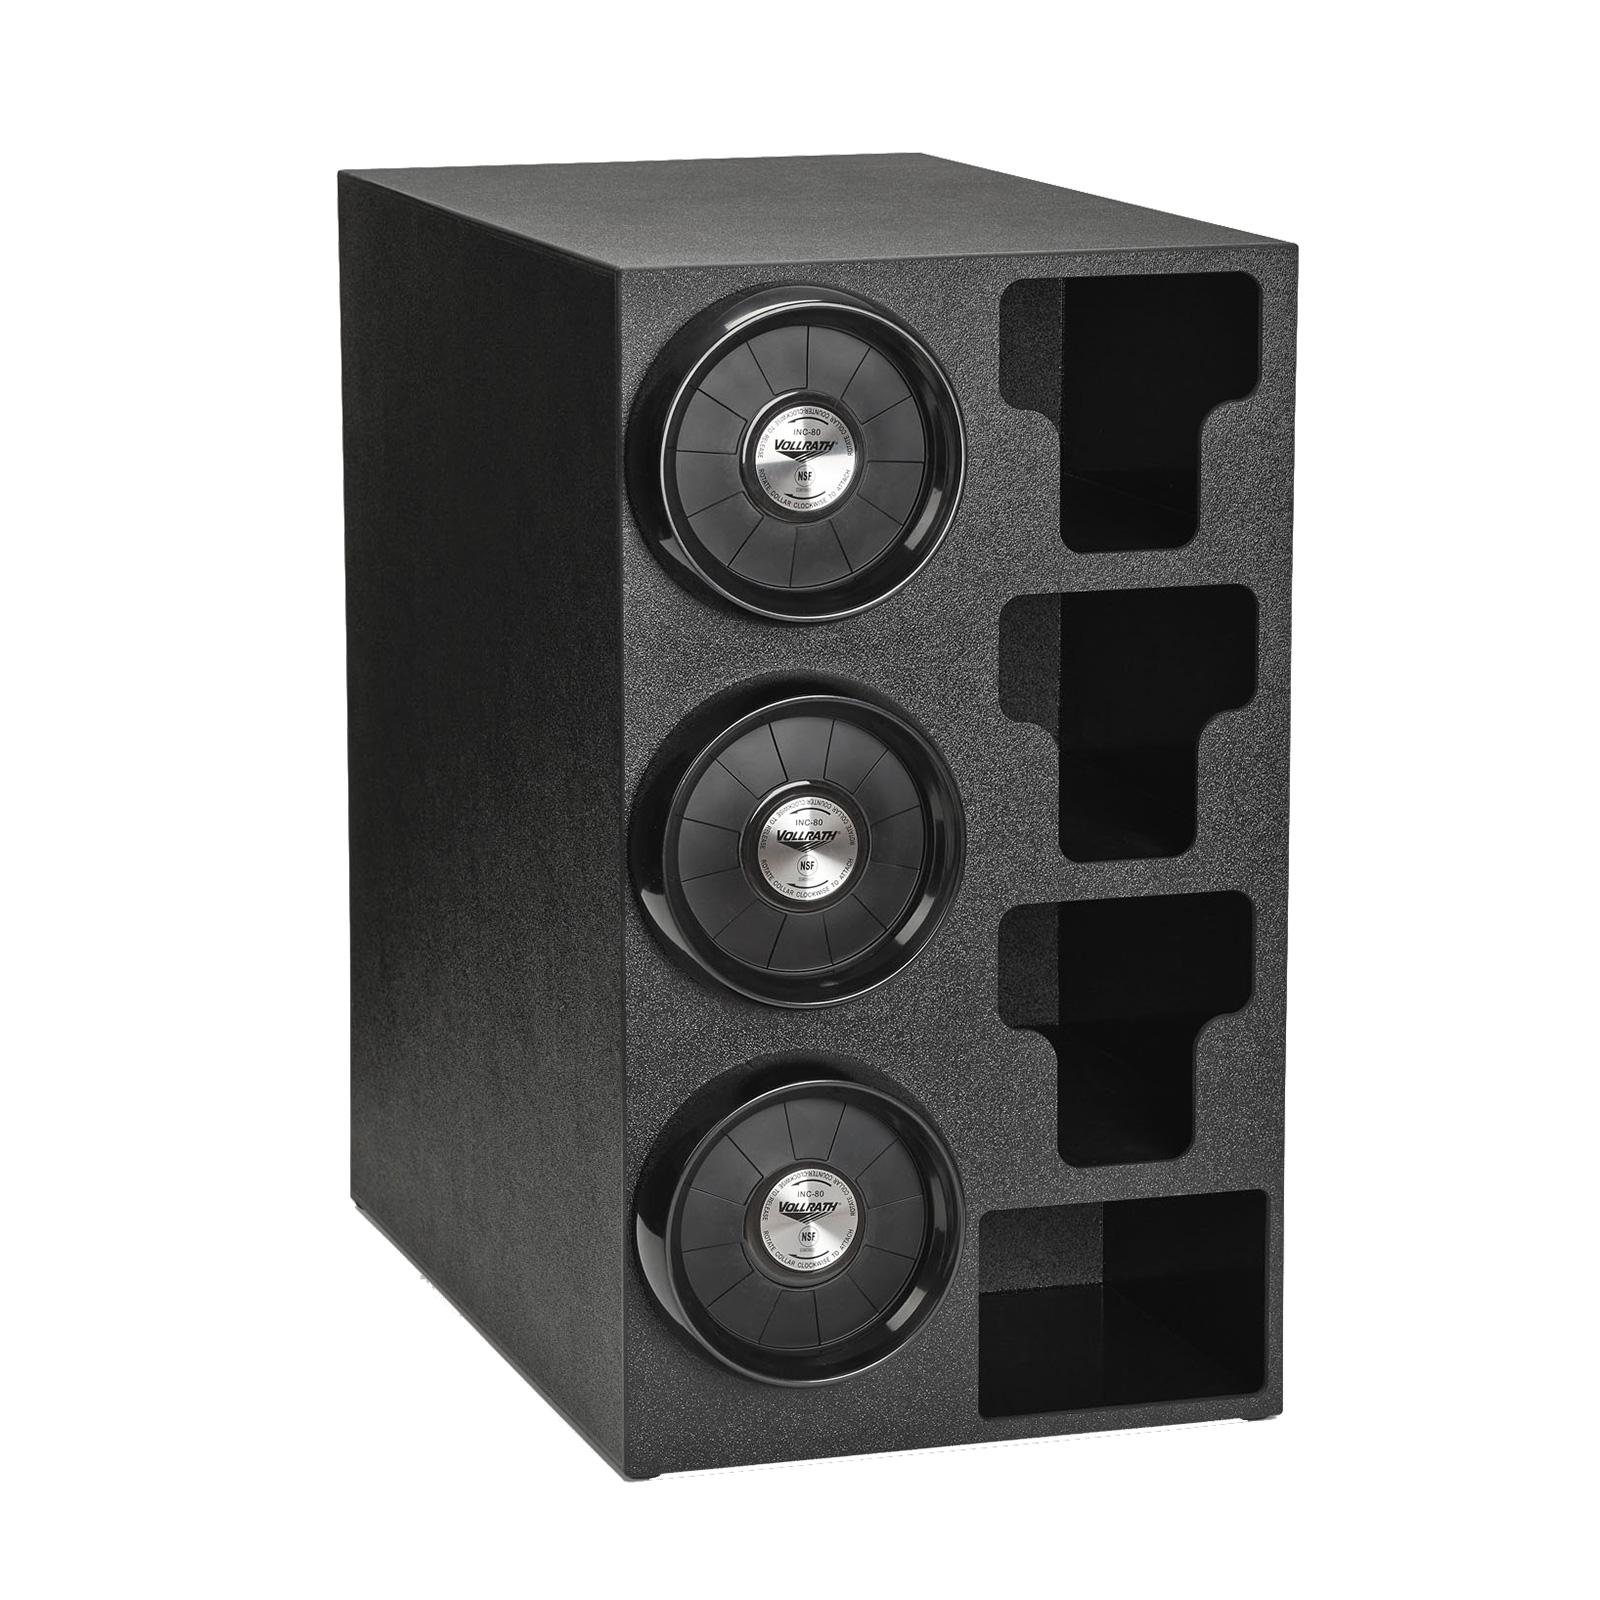 Vollrath G58806 cup dispensers, countertop